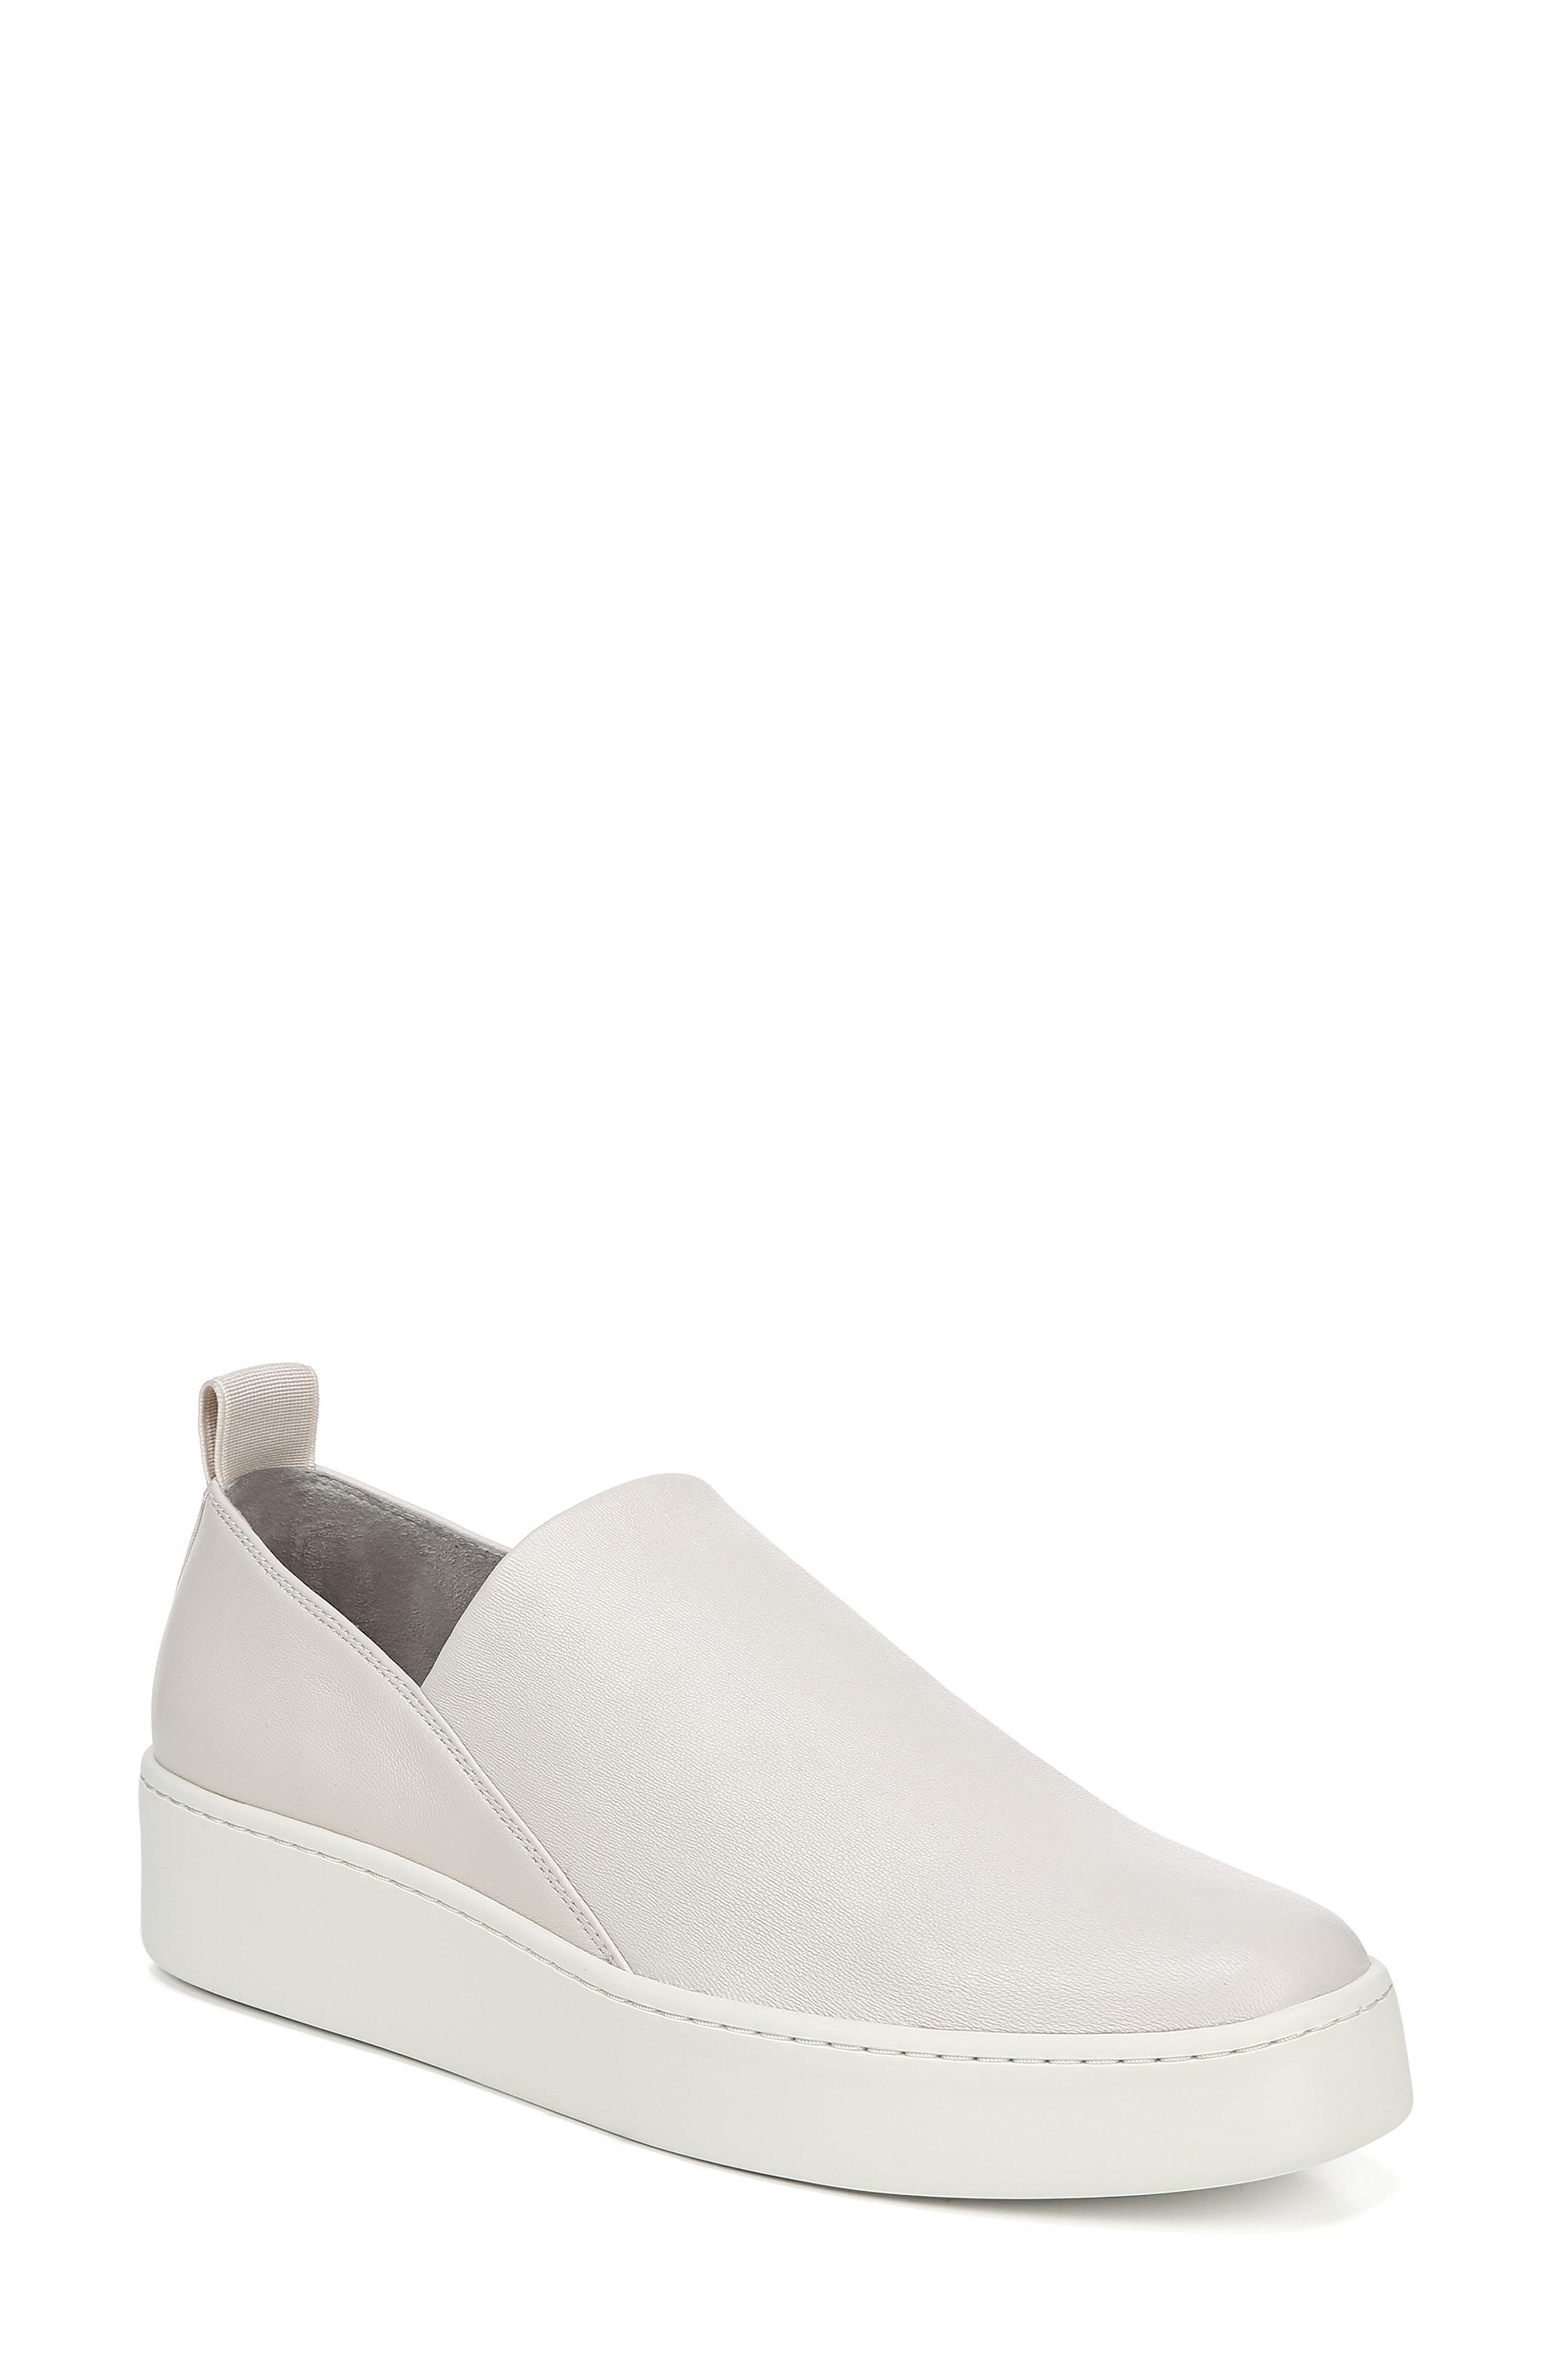 9310f5ce0552 Lyst - Vince Saxon Slip-on Sneaker in White